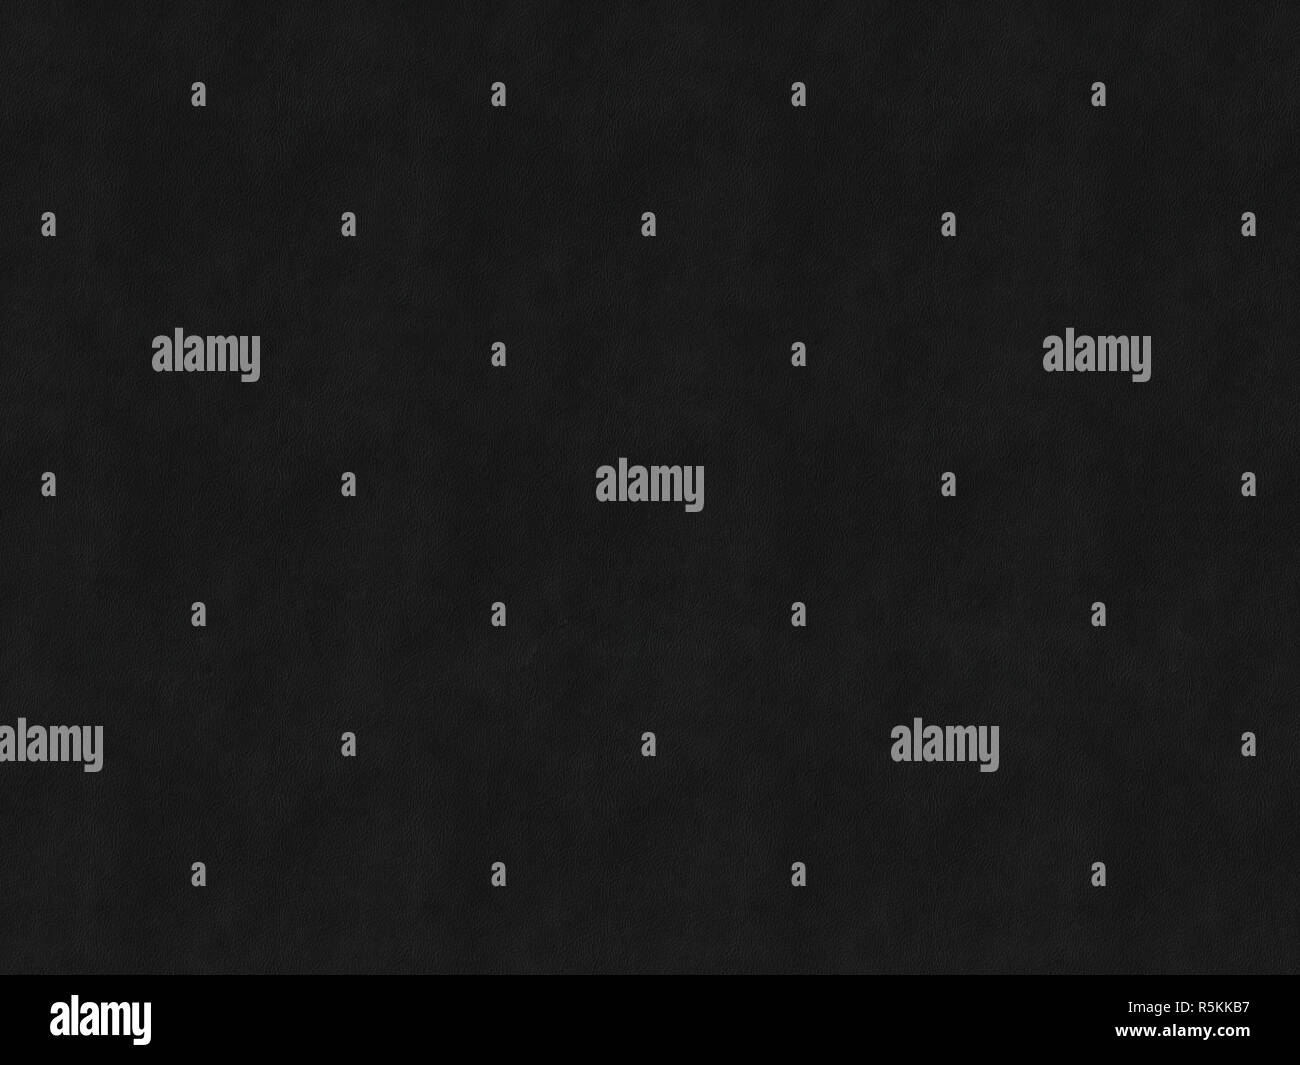 Leather texture/textura de cuero - Stock Image